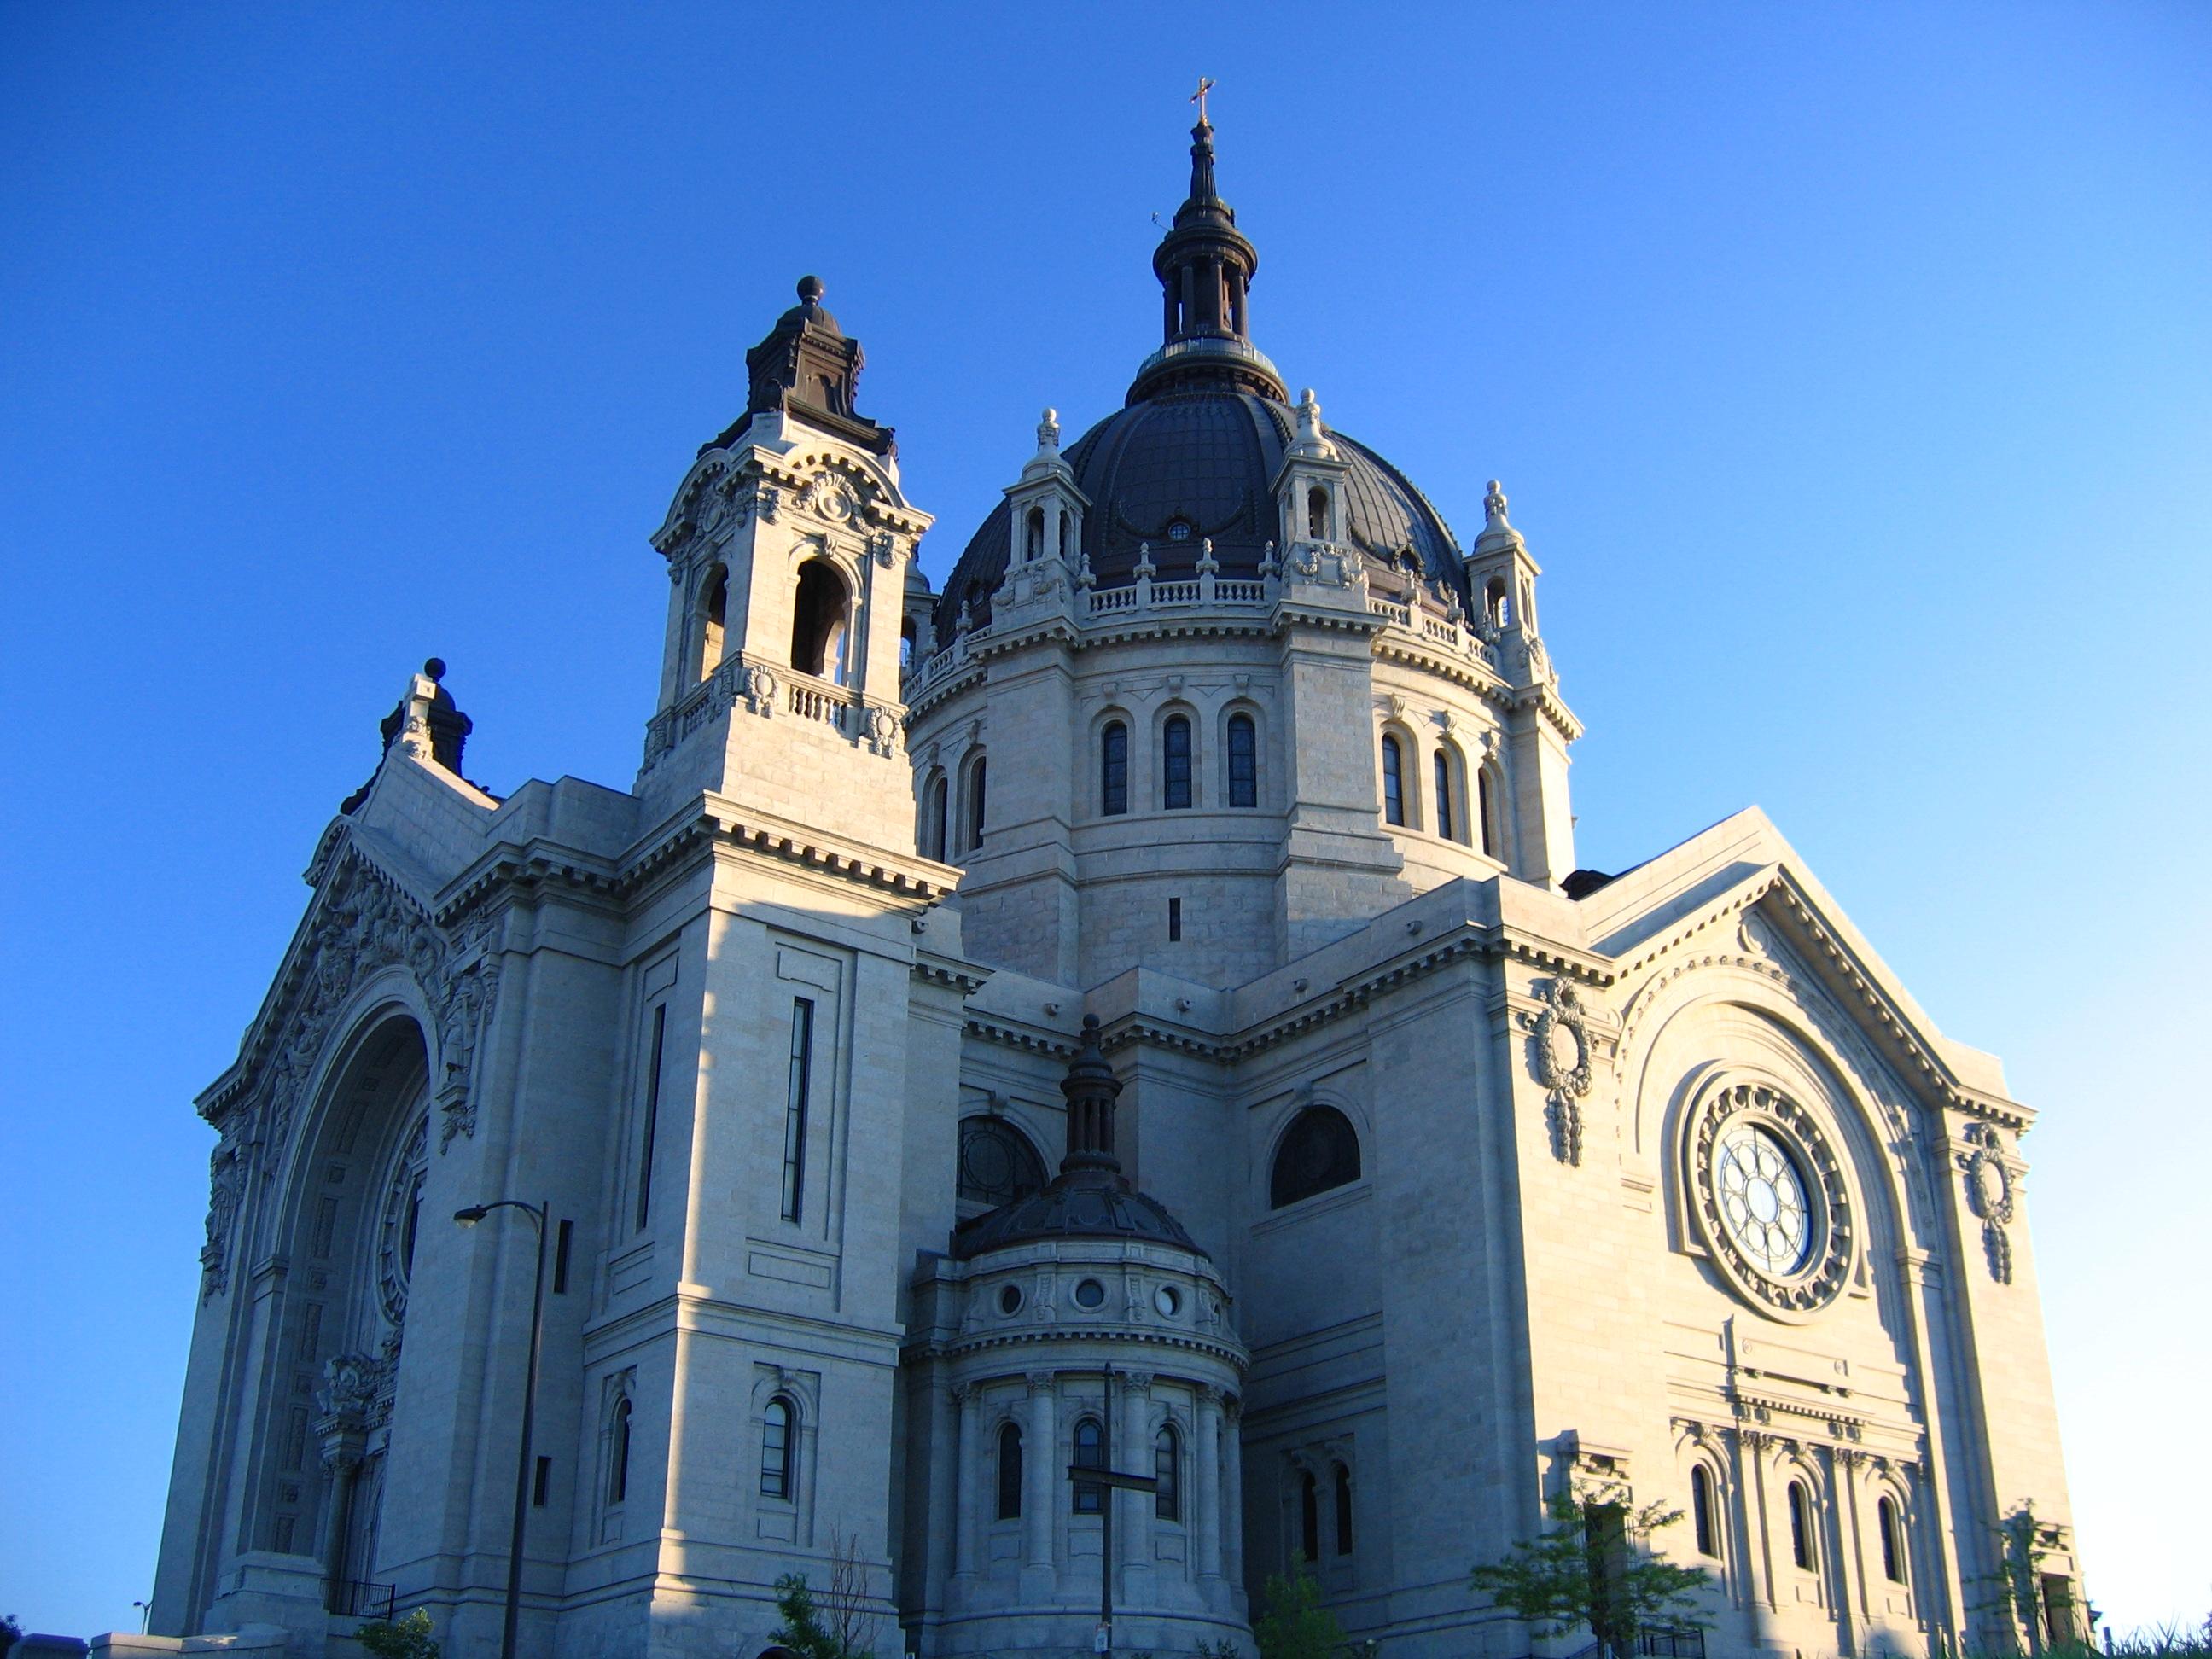 Cathedral_of_Saint_Paul_Minnesota-1